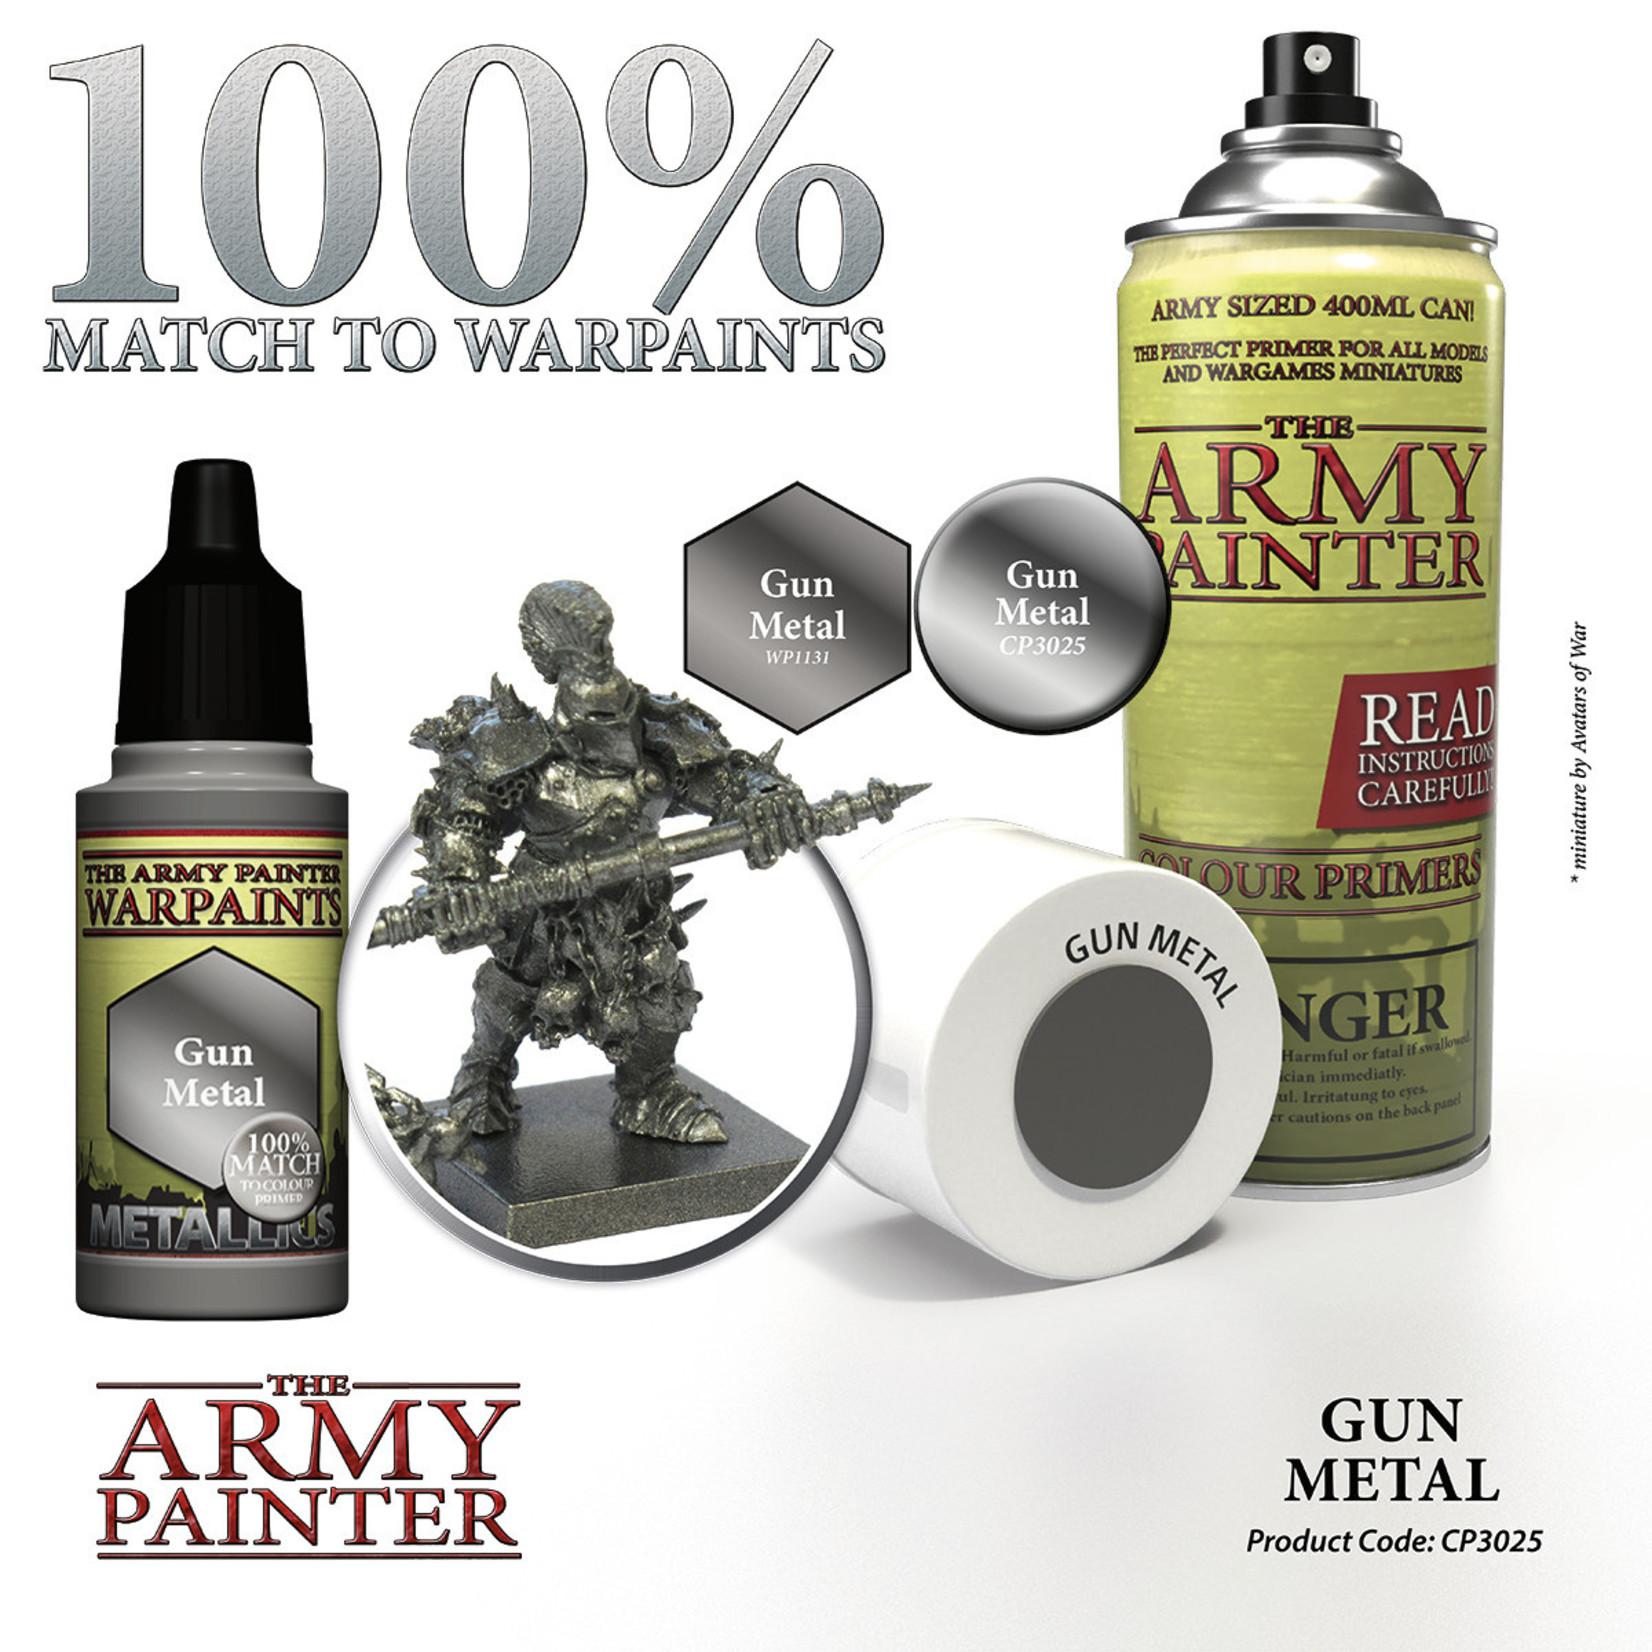 The Army Painter Color Primer Gun Metal